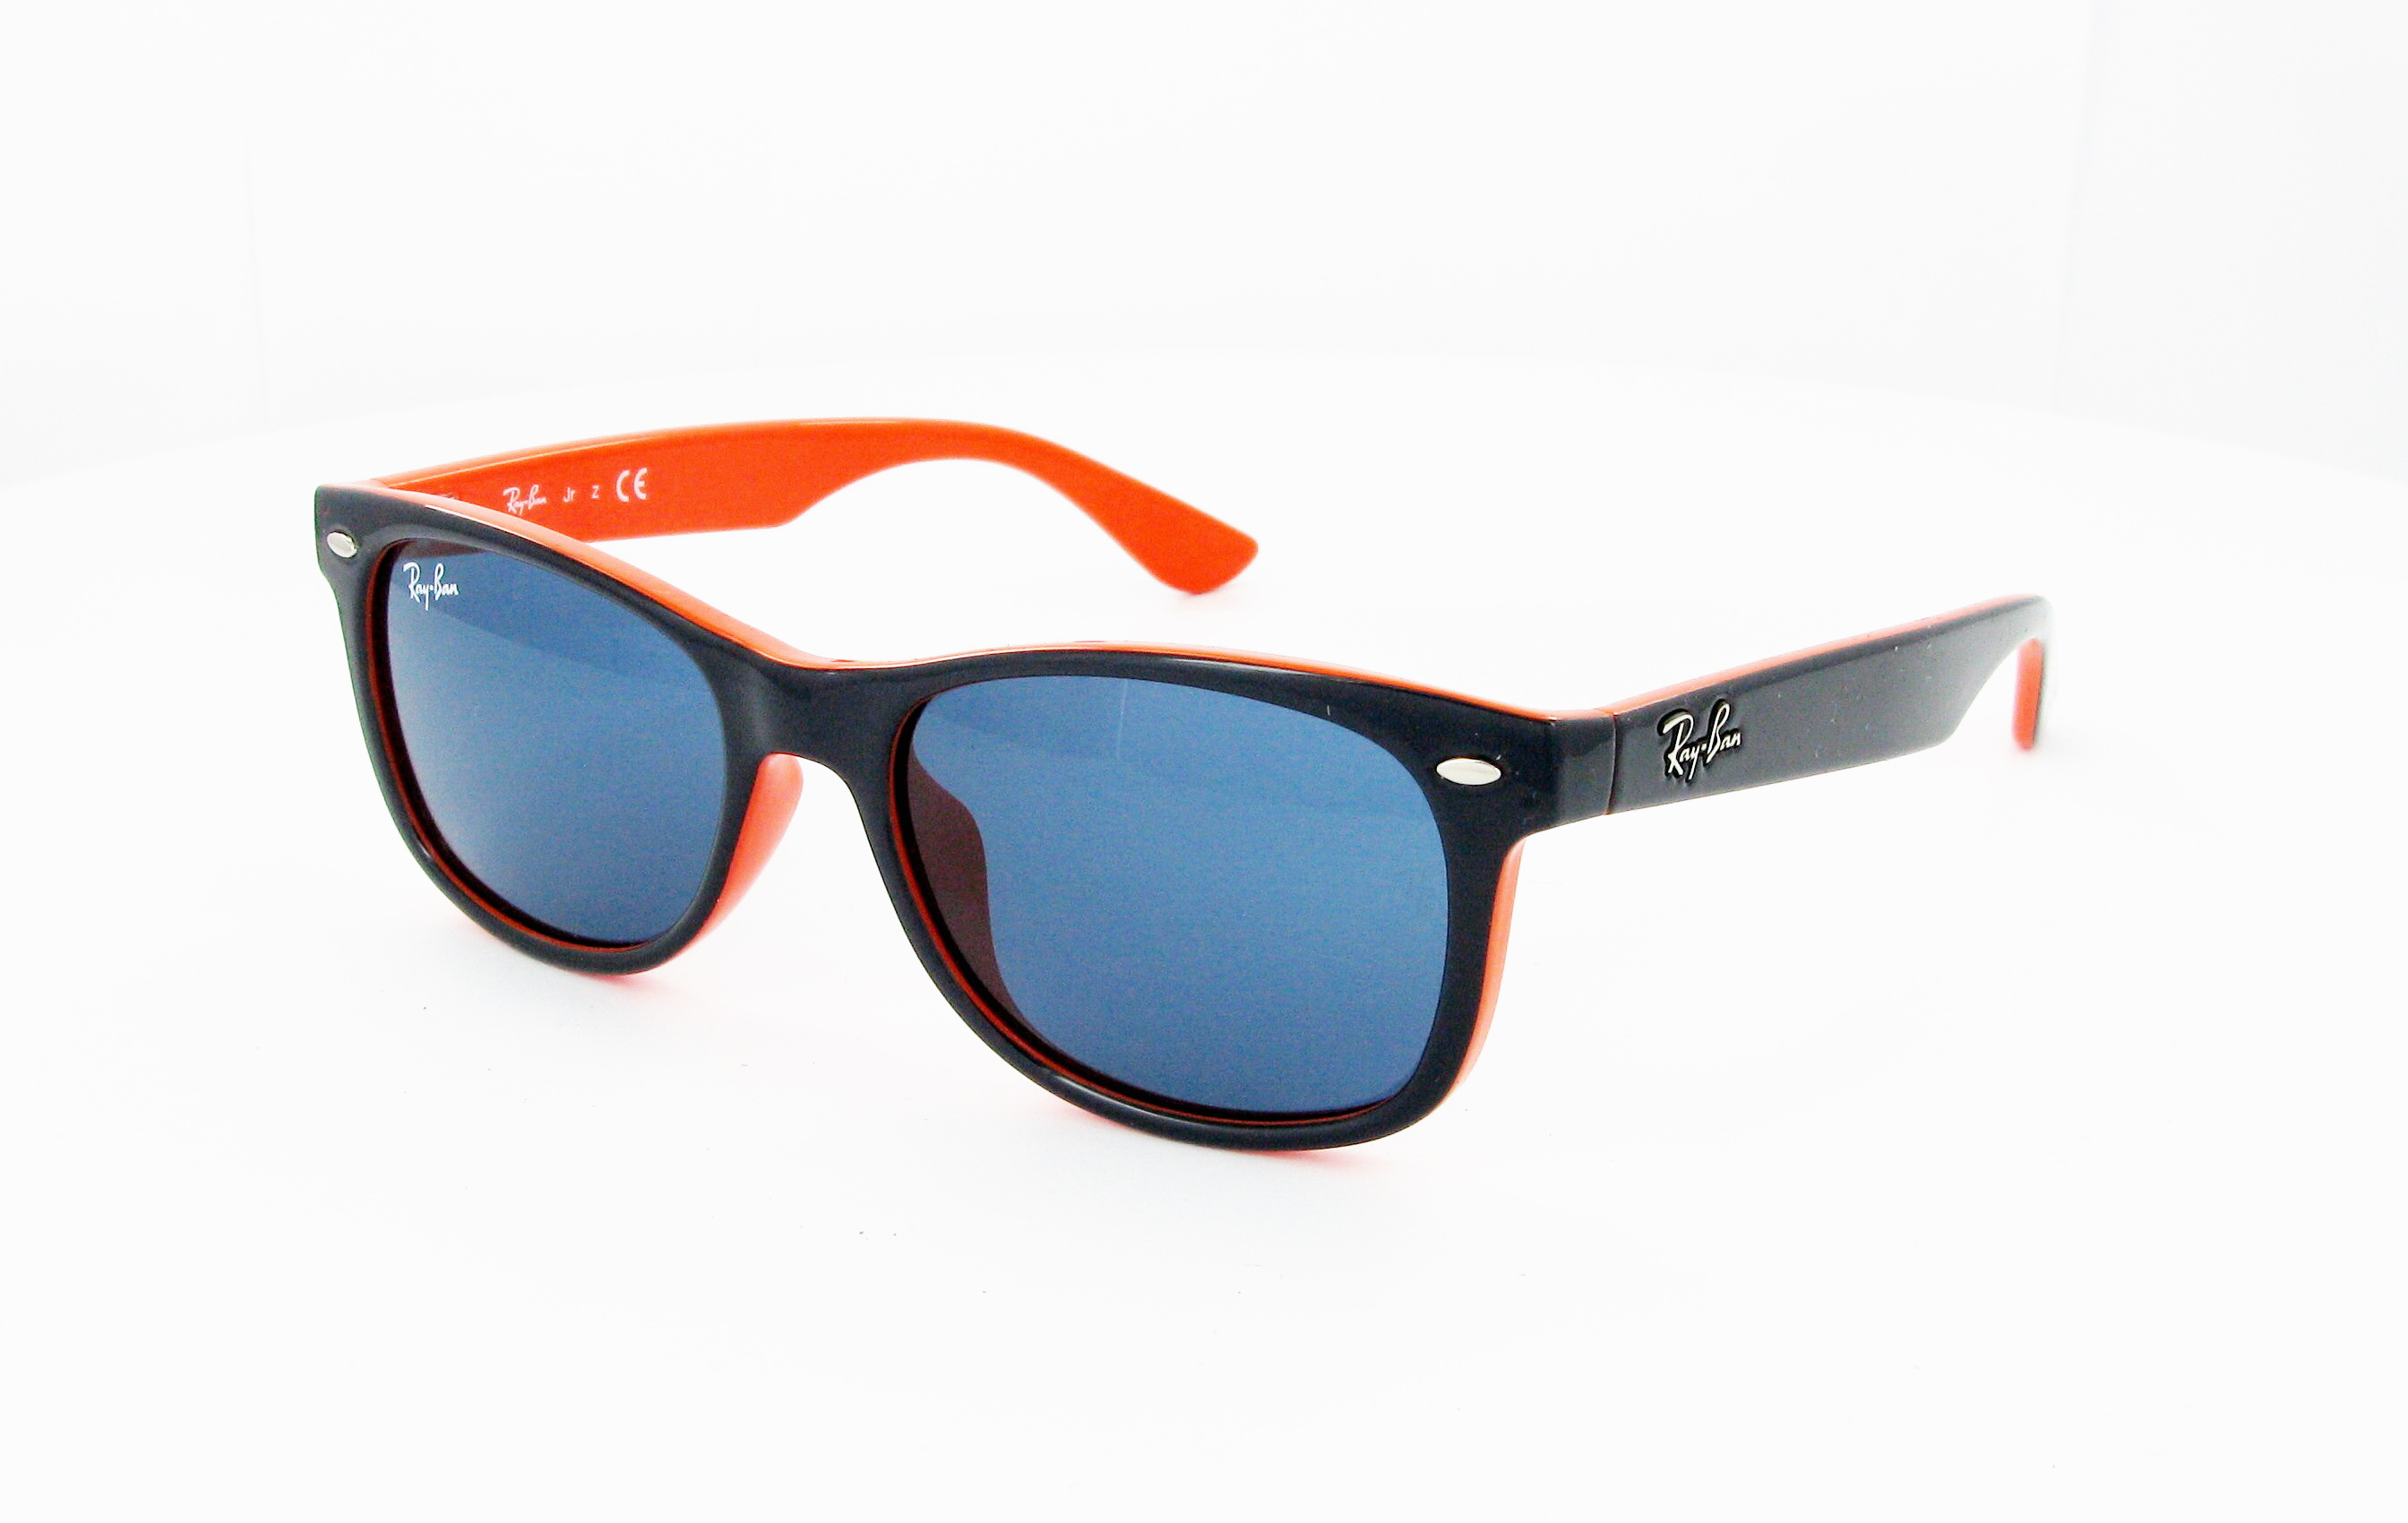 lunettes de soleil ray ban junior rj 9052s 178 80 47 15 enfant bleu orange vintage cercl e. Black Bedroom Furniture Sets. Home Design Ideas